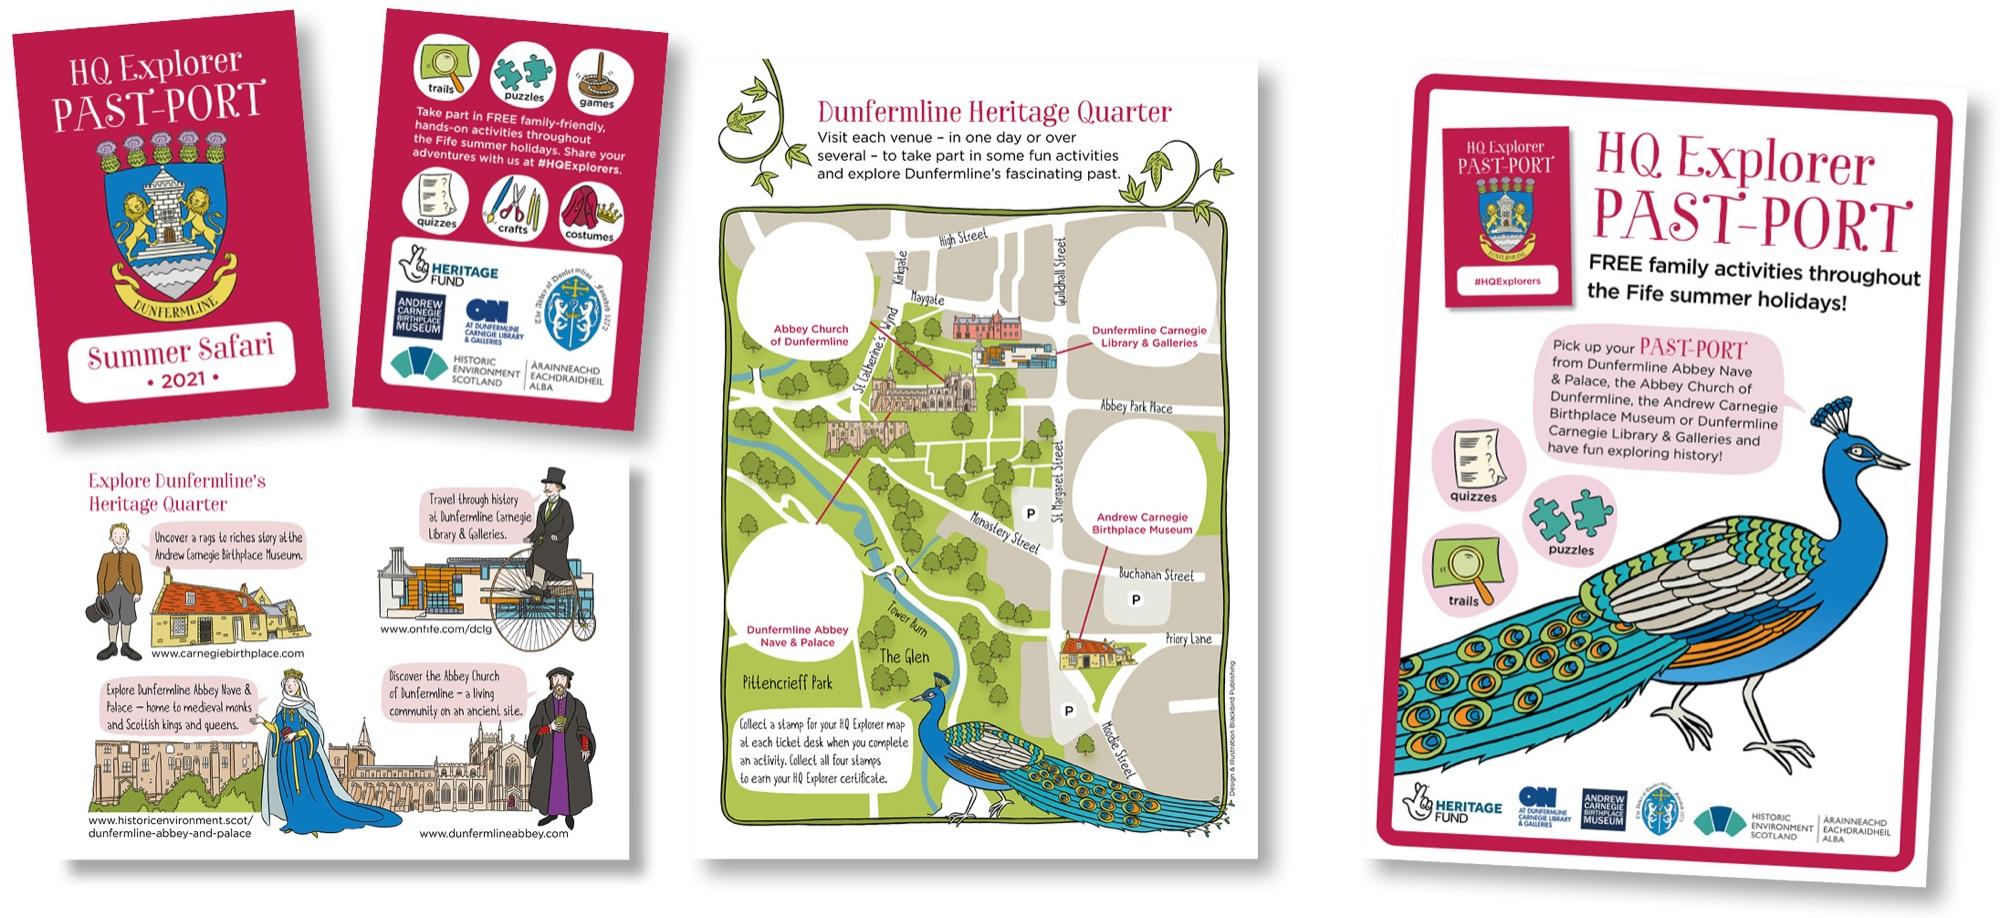 Blackbird Publishing Family Activity Trails Fold-out Activity Leaflet Dunfermline Heritage Quarter Explorer Past-port